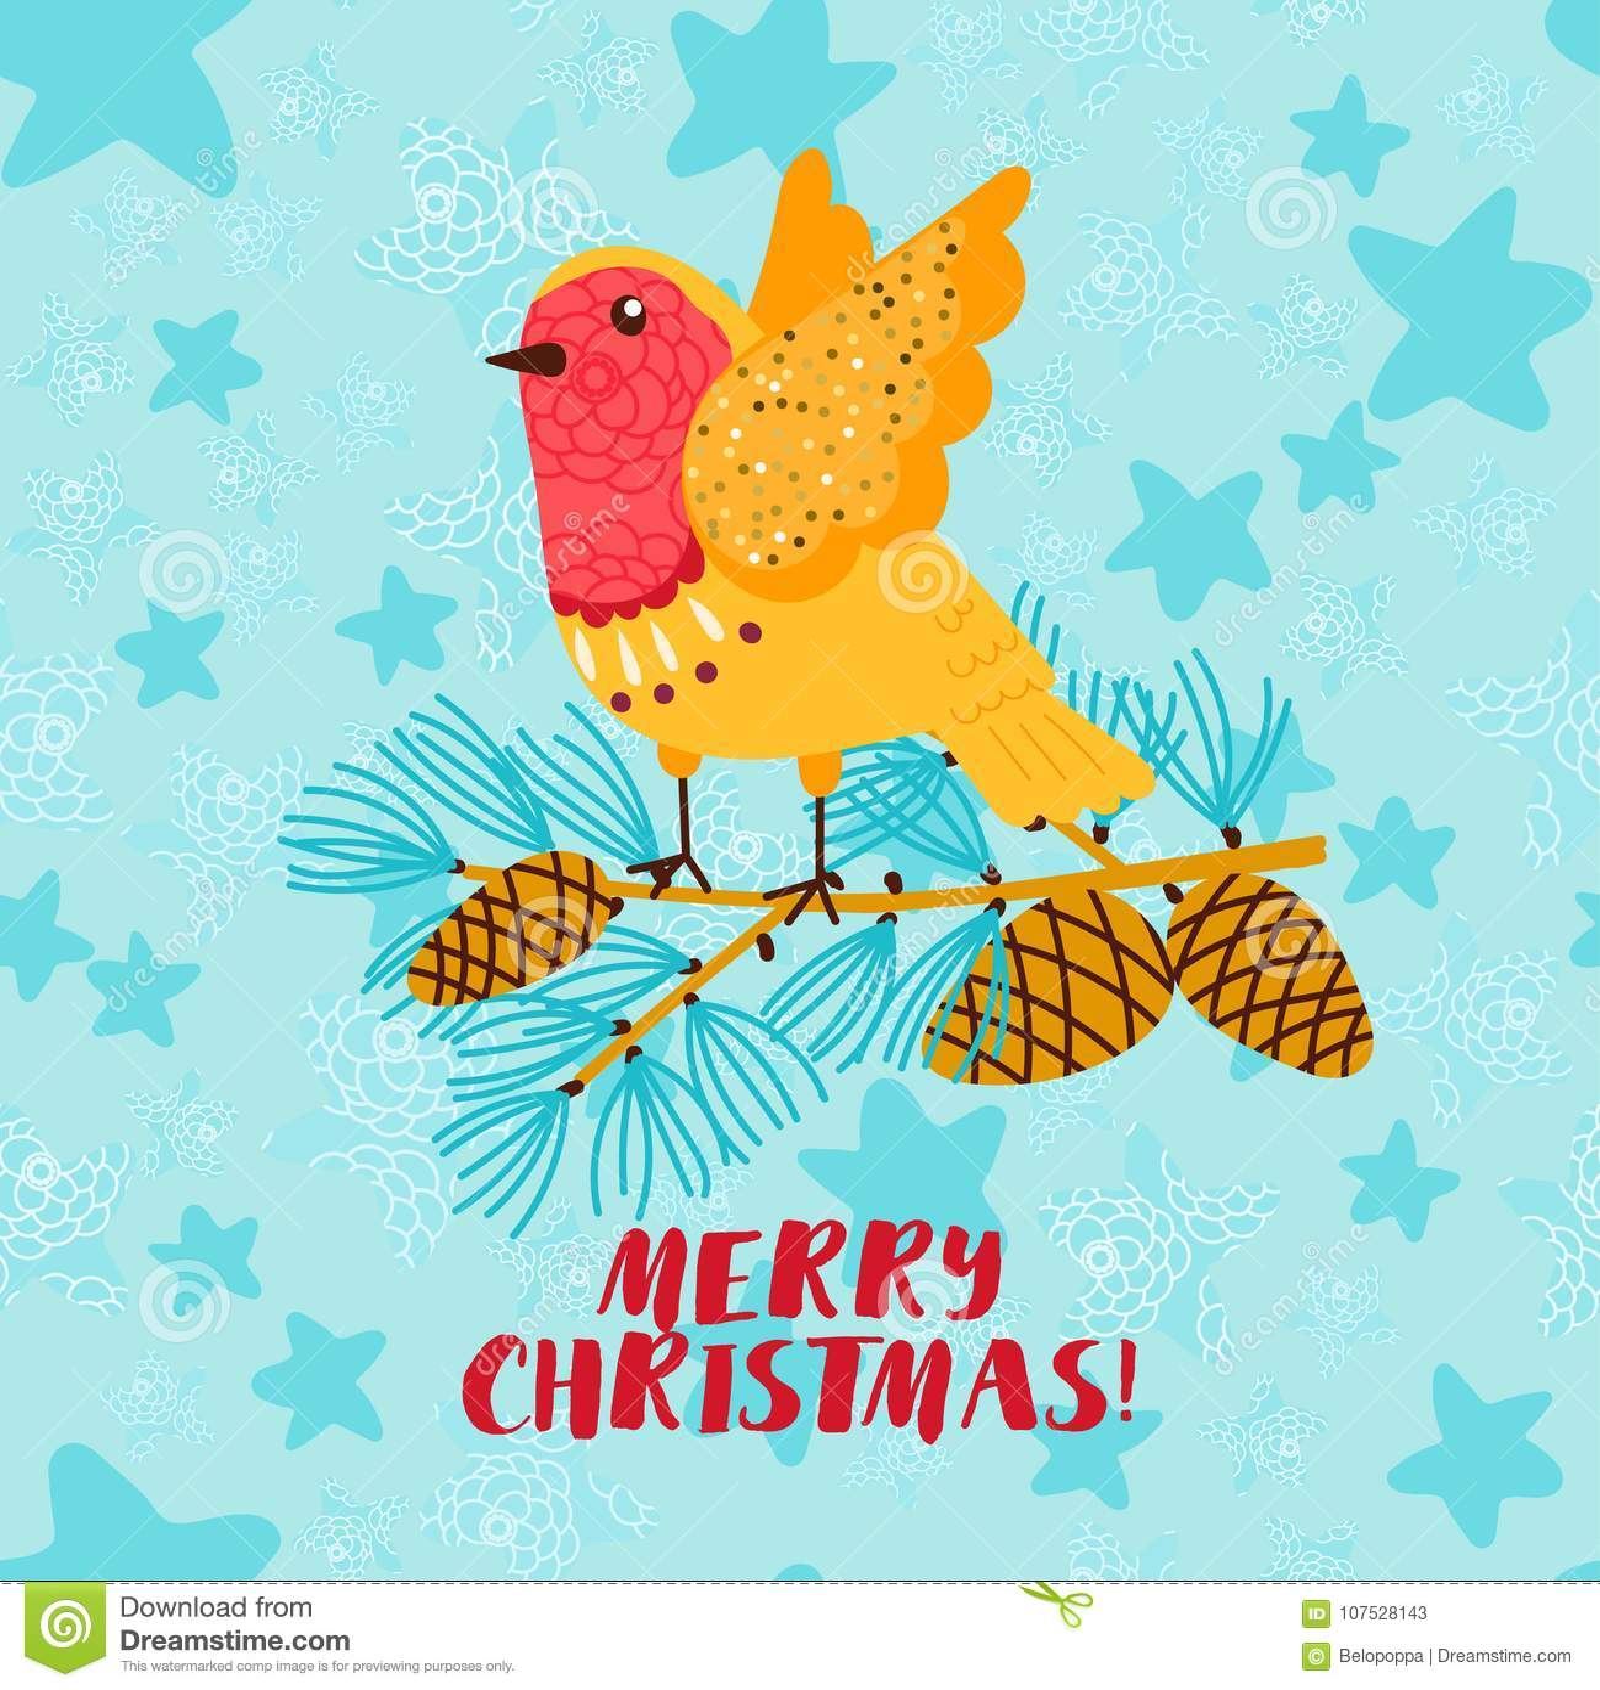 Merry Christmas Greeting Card With Robin Bird Stock Vector